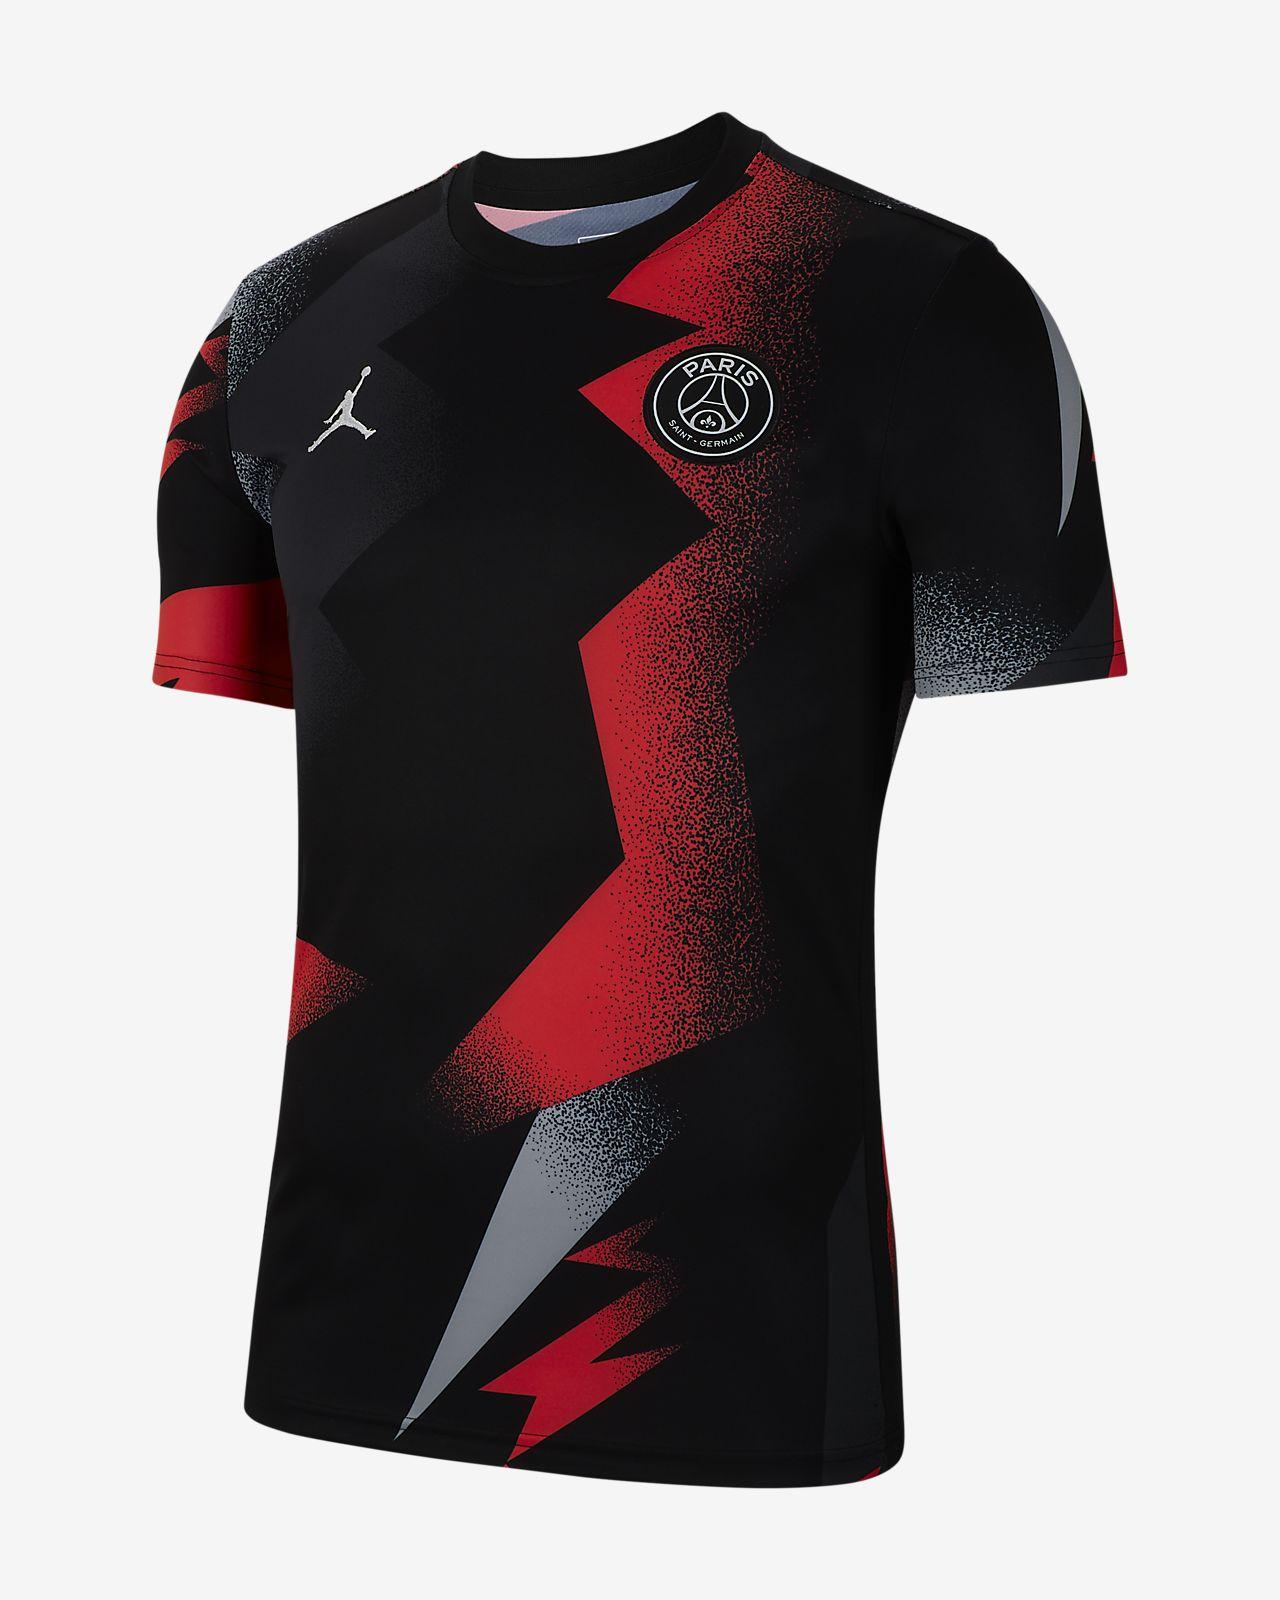 Pánské fotbalové tričko Paris Saint-Germain s krátkým rukávem